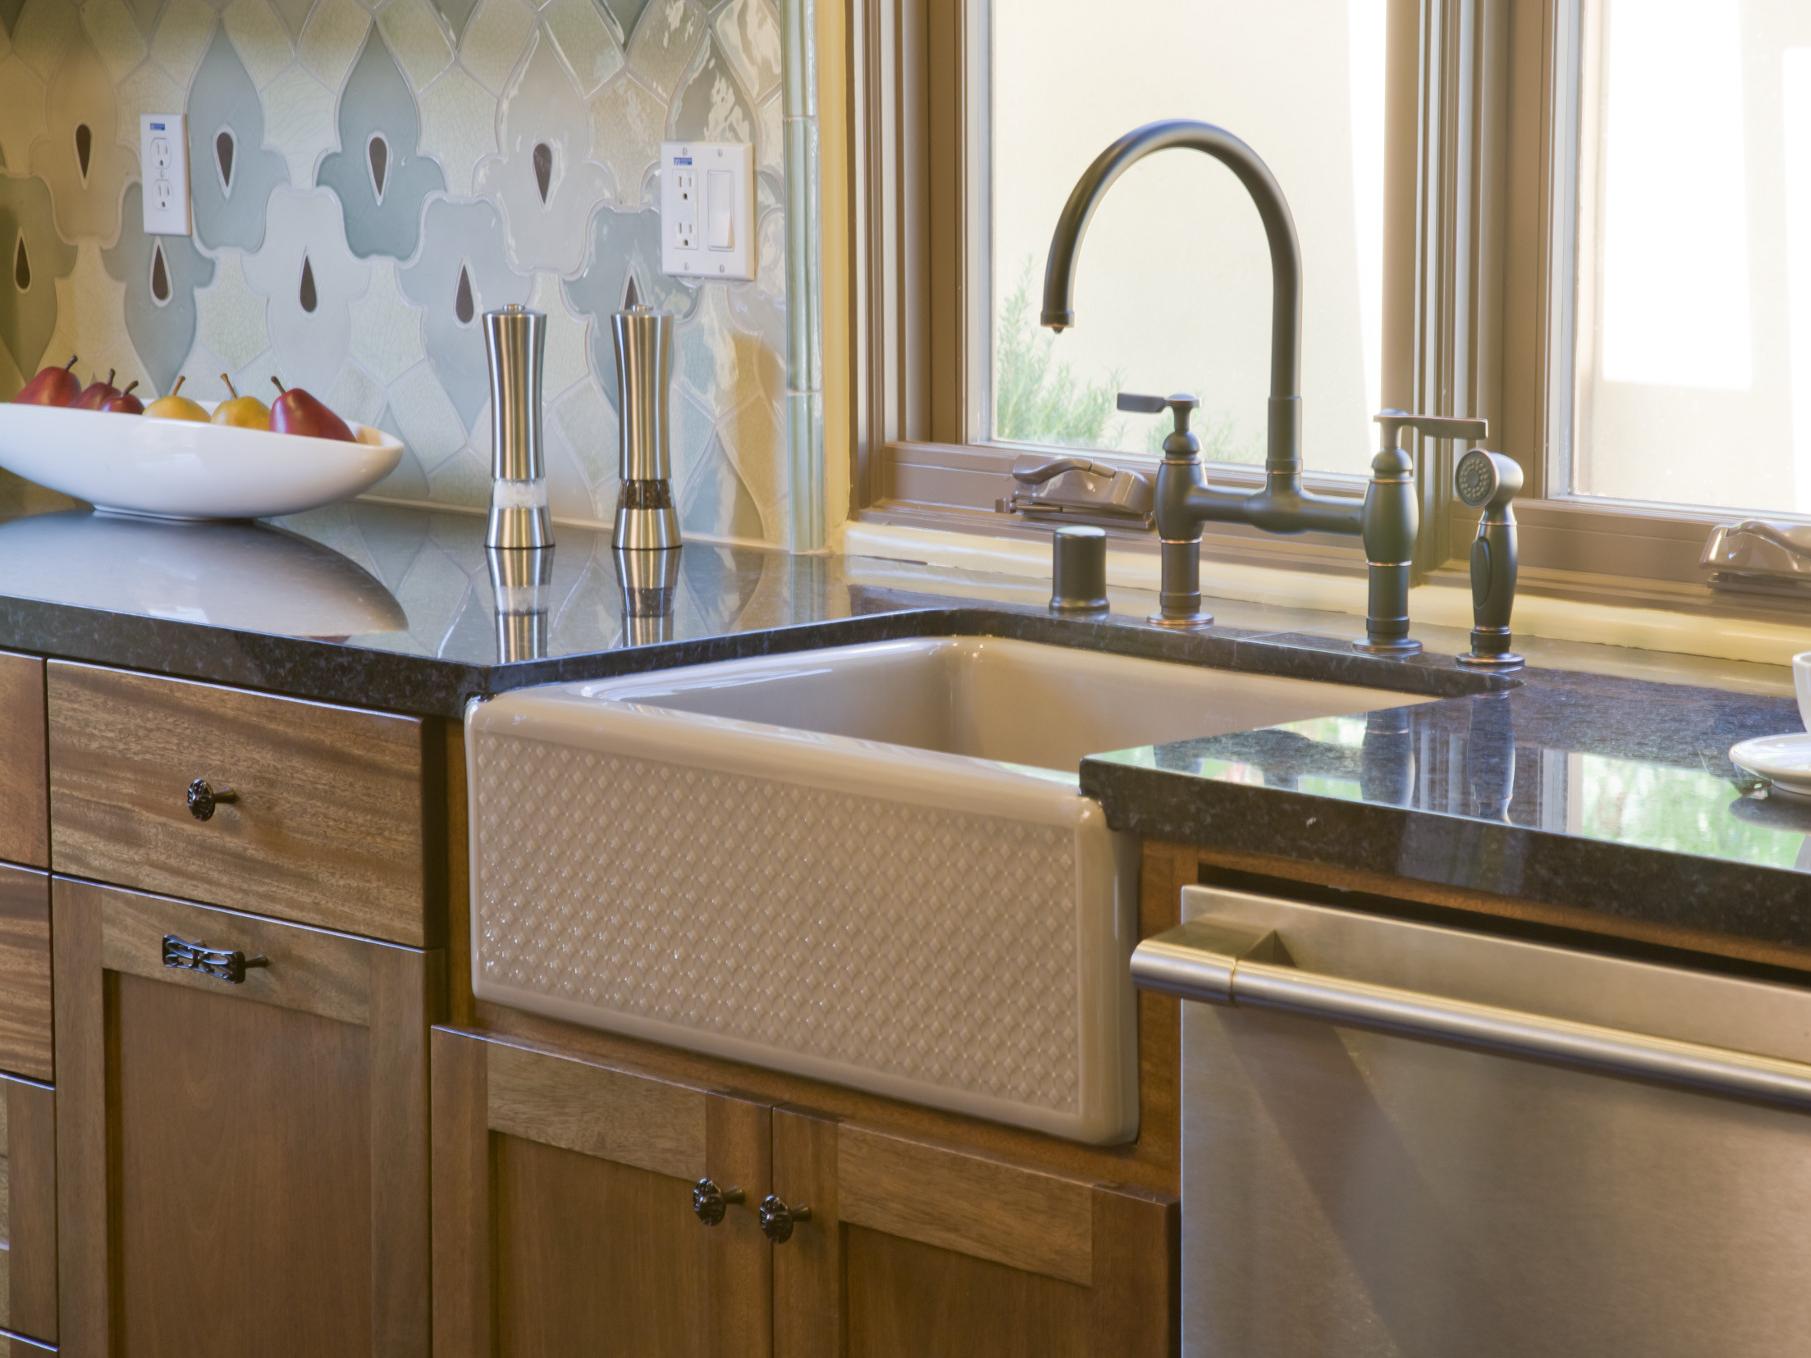 Waterware Kitchen & Bath Designer Showrooms